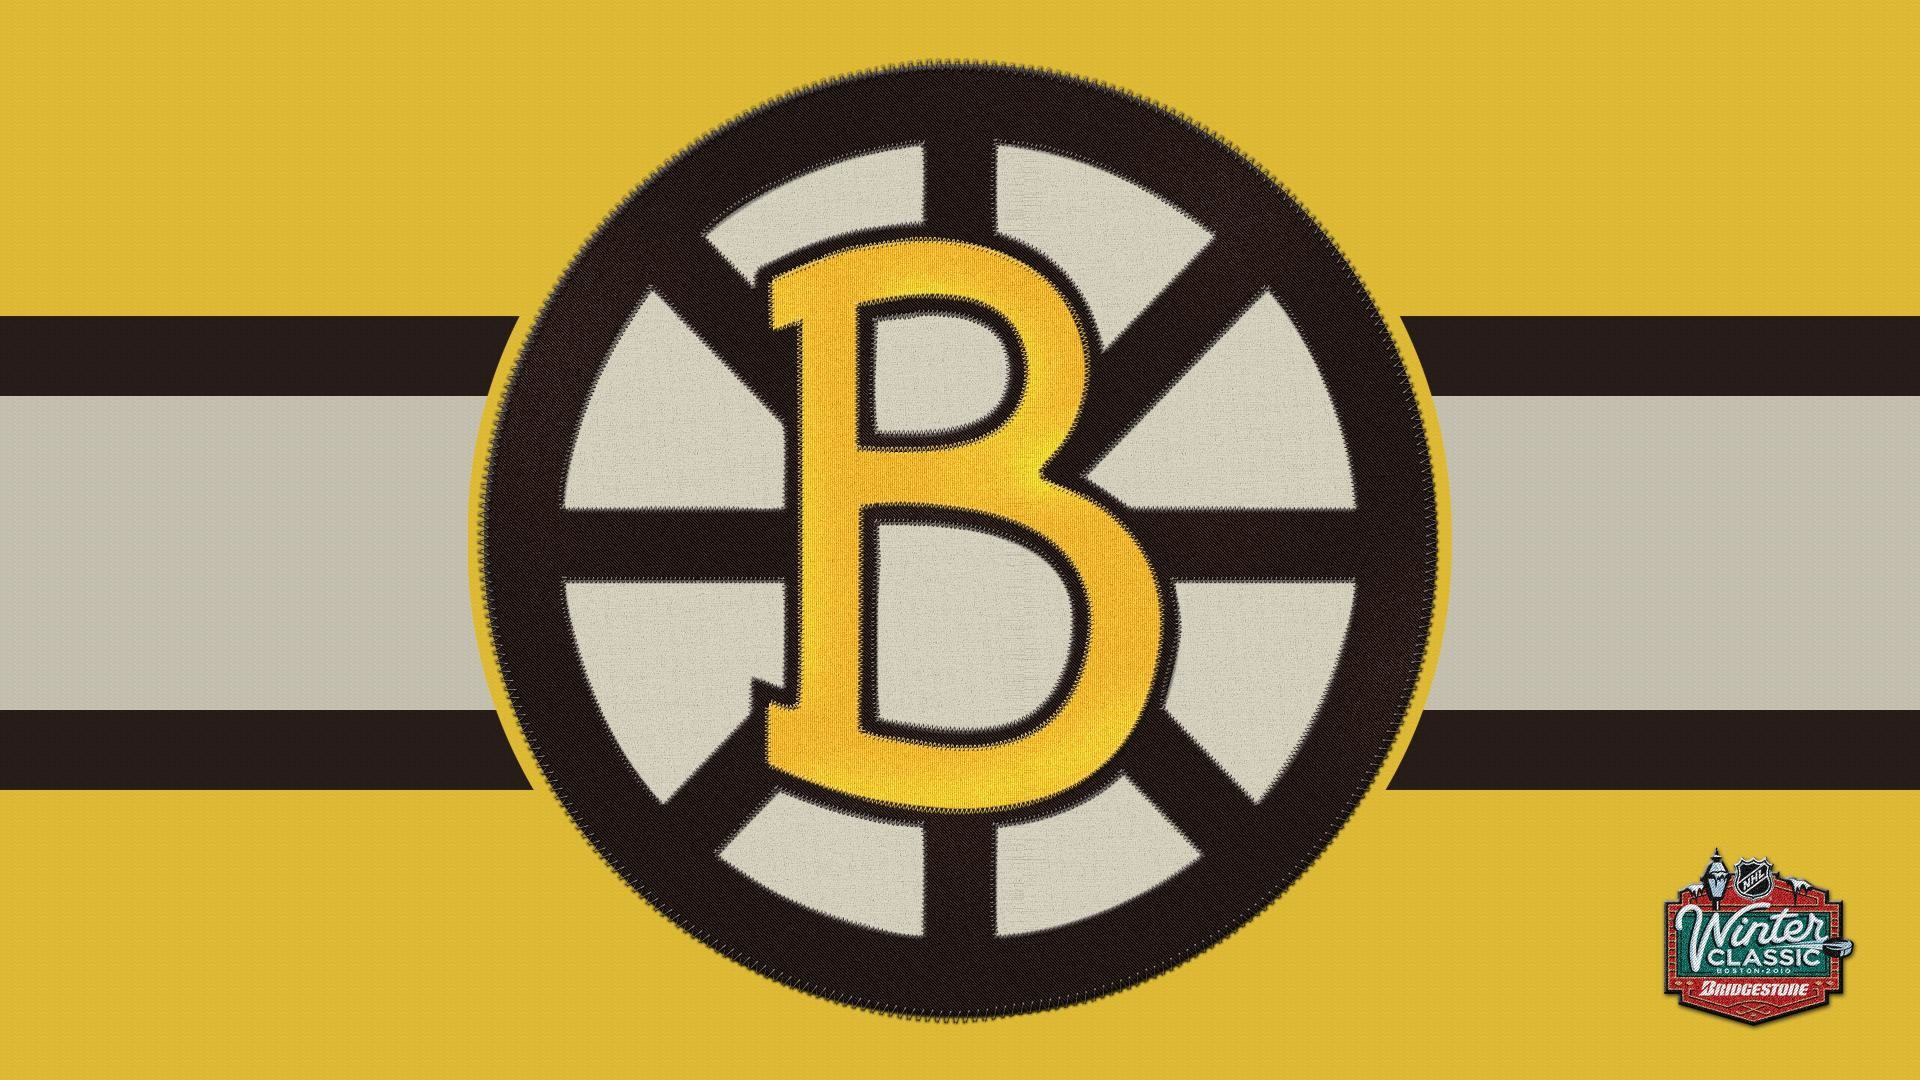 Awesome Boston Bruins wallpaper   Boston Bruins wallpapers